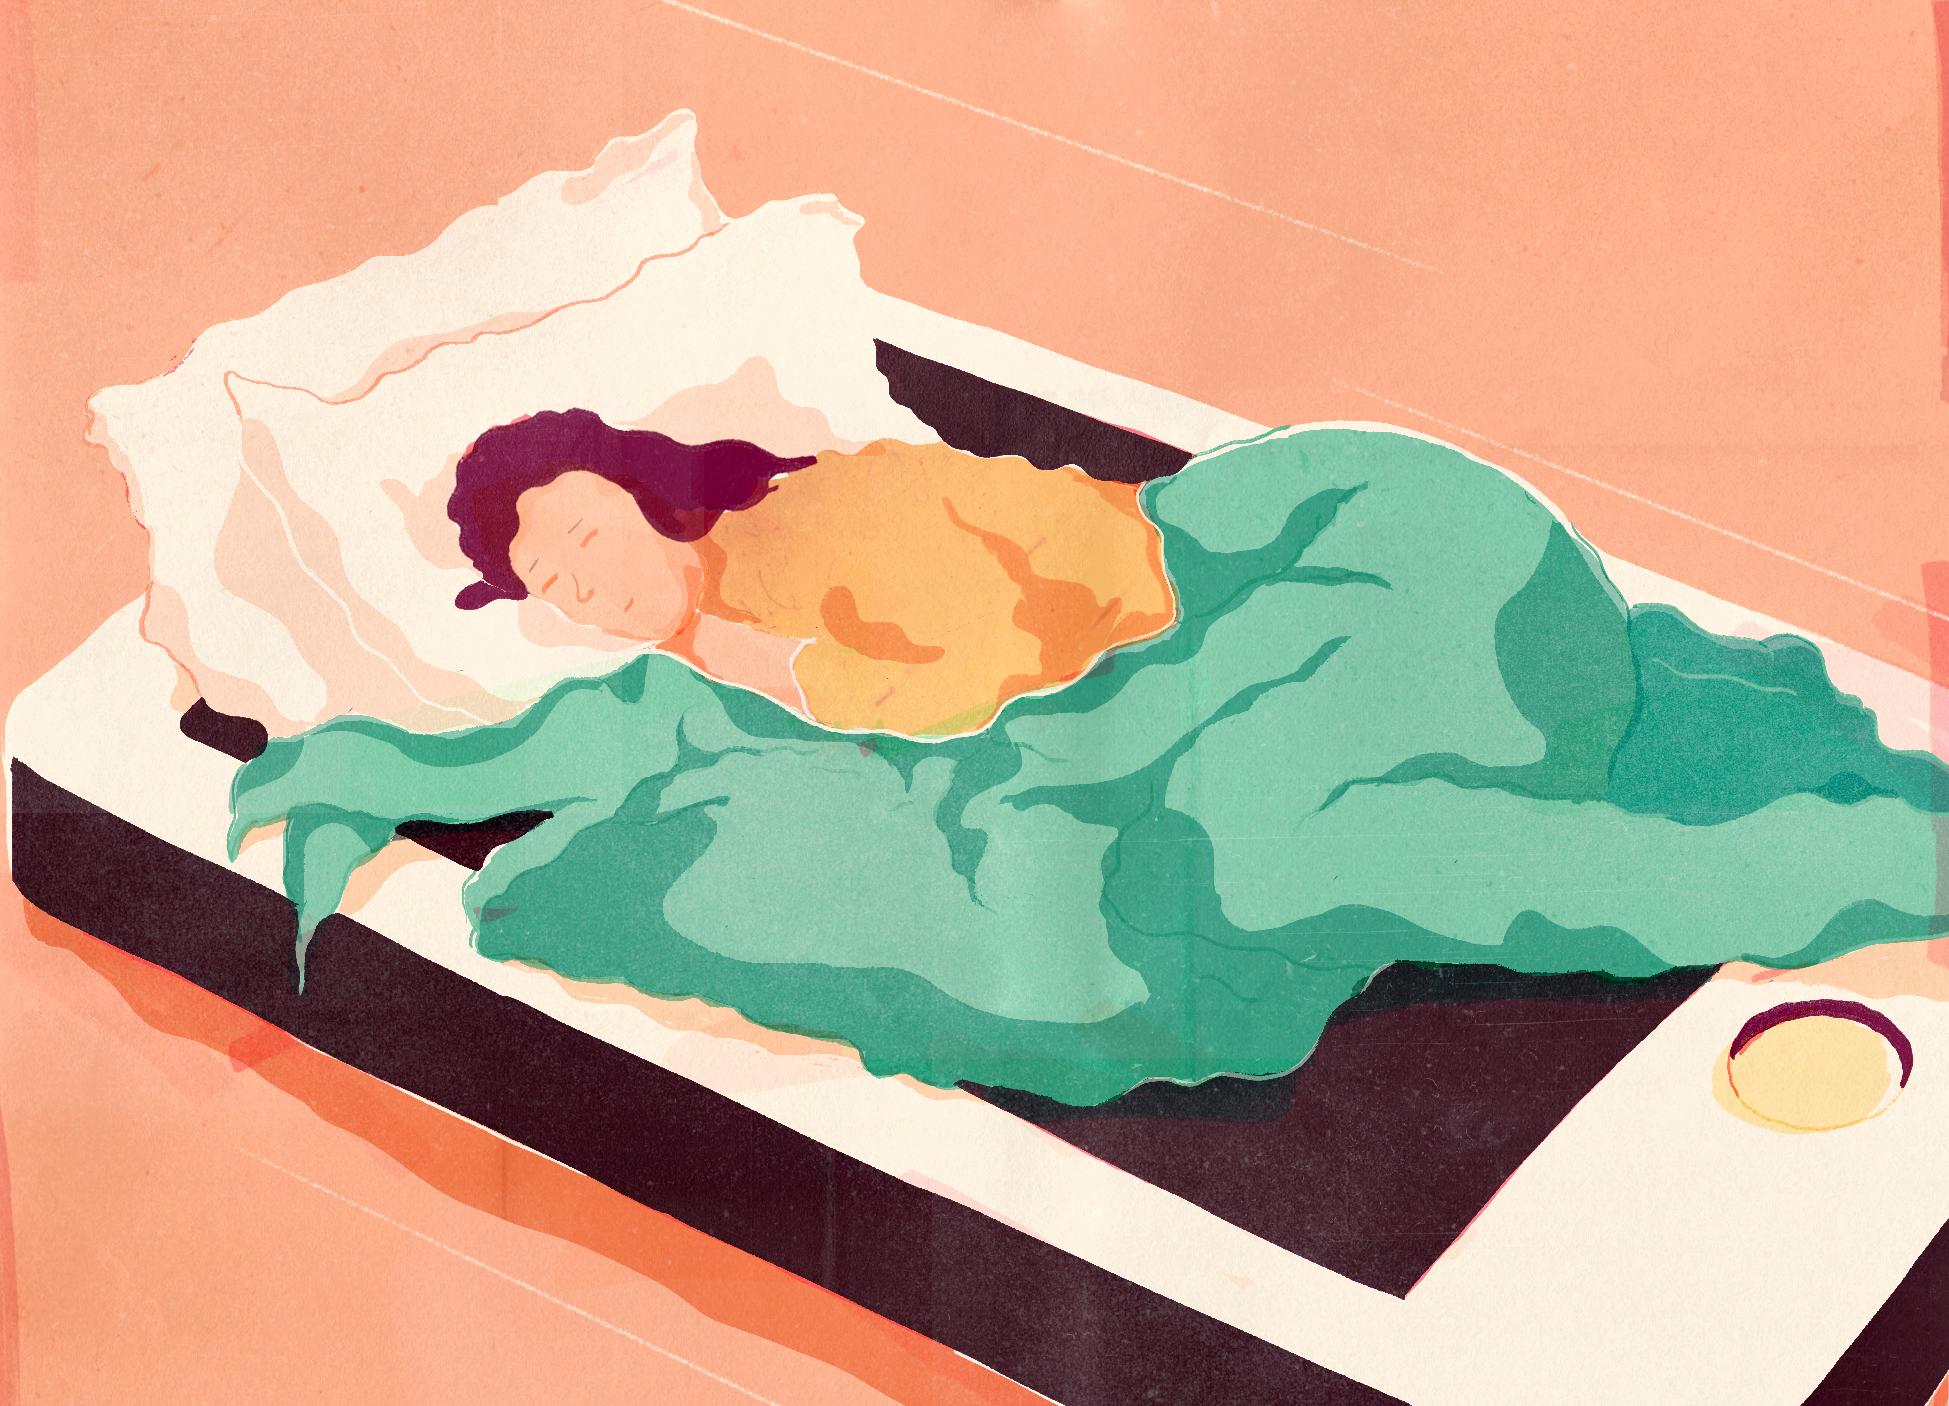 Illustrations by Pavel Mishkin.